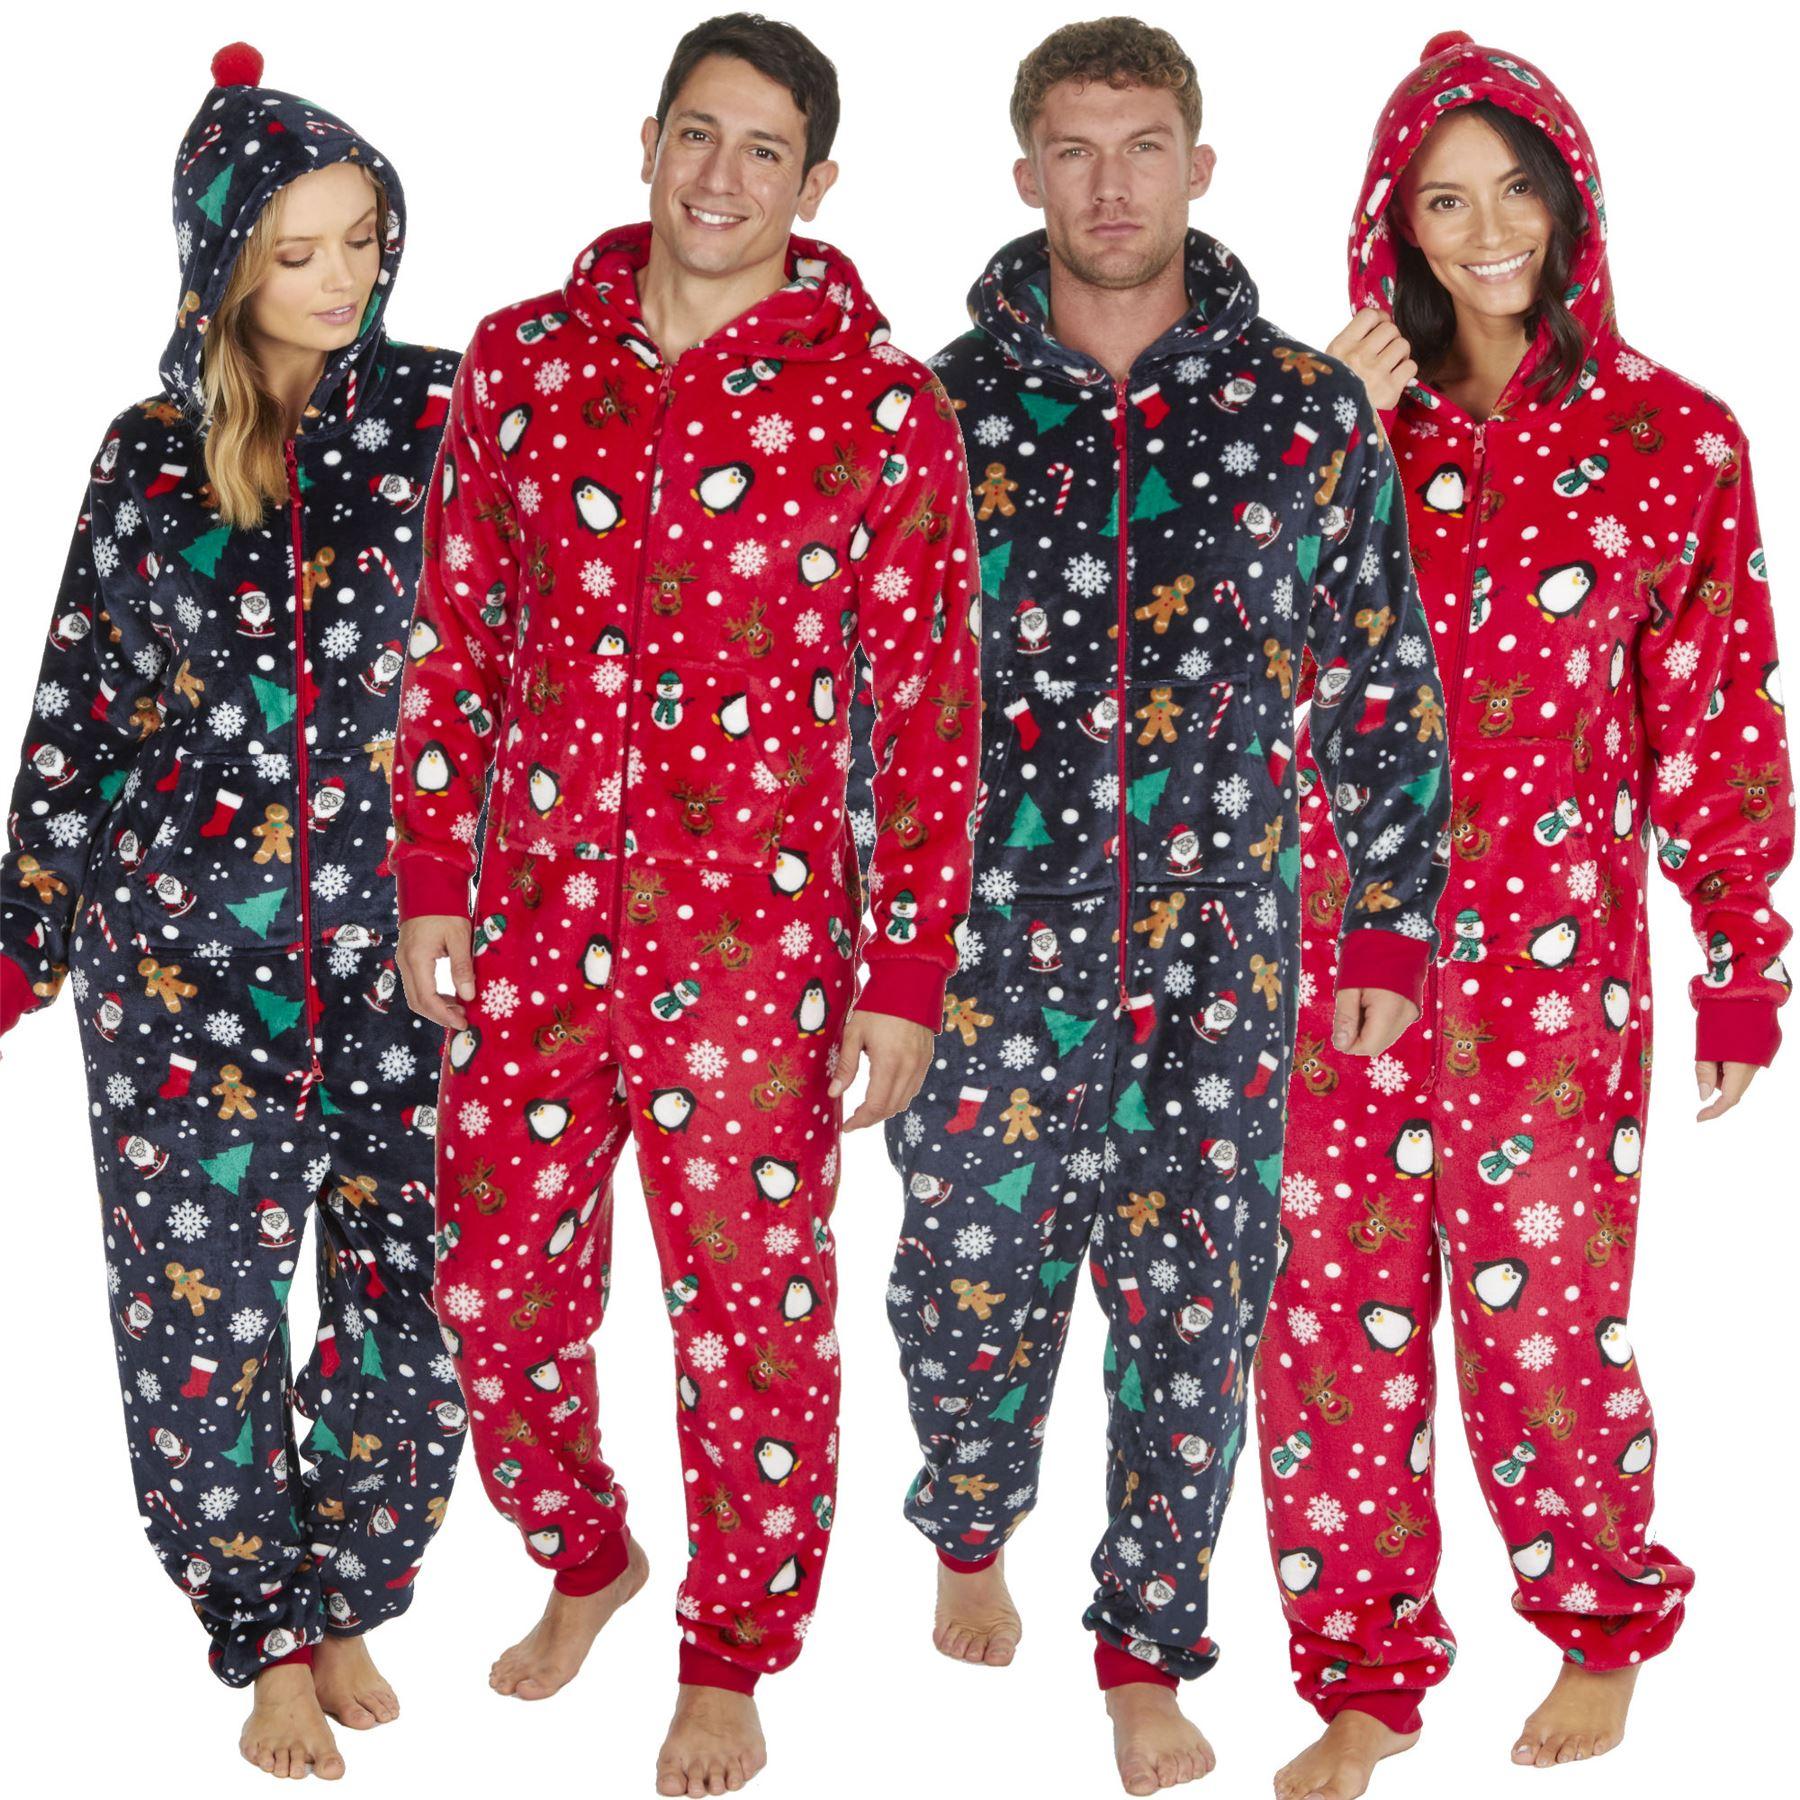 c9df9229e9 Details about 1Onesie Matching His N Hers Womens Mens Onezee Xmas Soft  Fleece Pyjamas Pjs